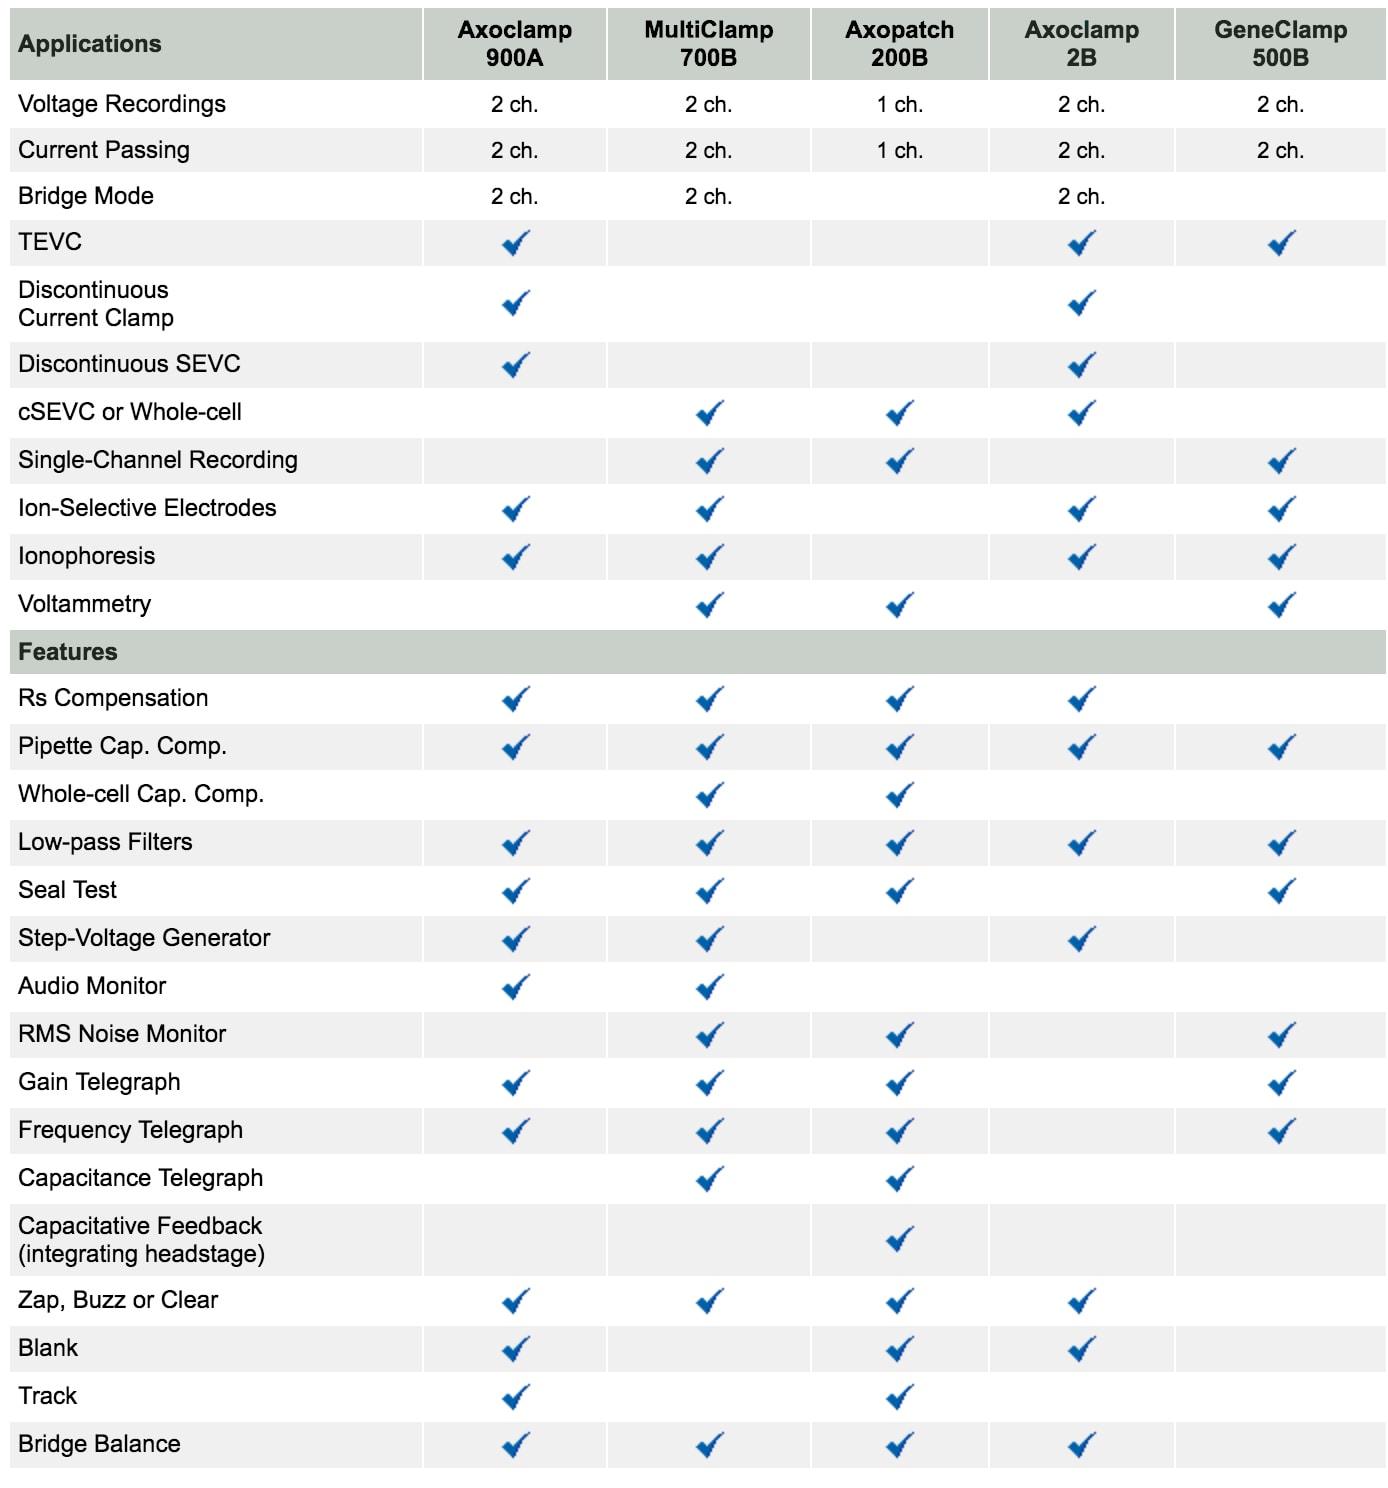 Microelectrode Amplifiers Comparison Chart